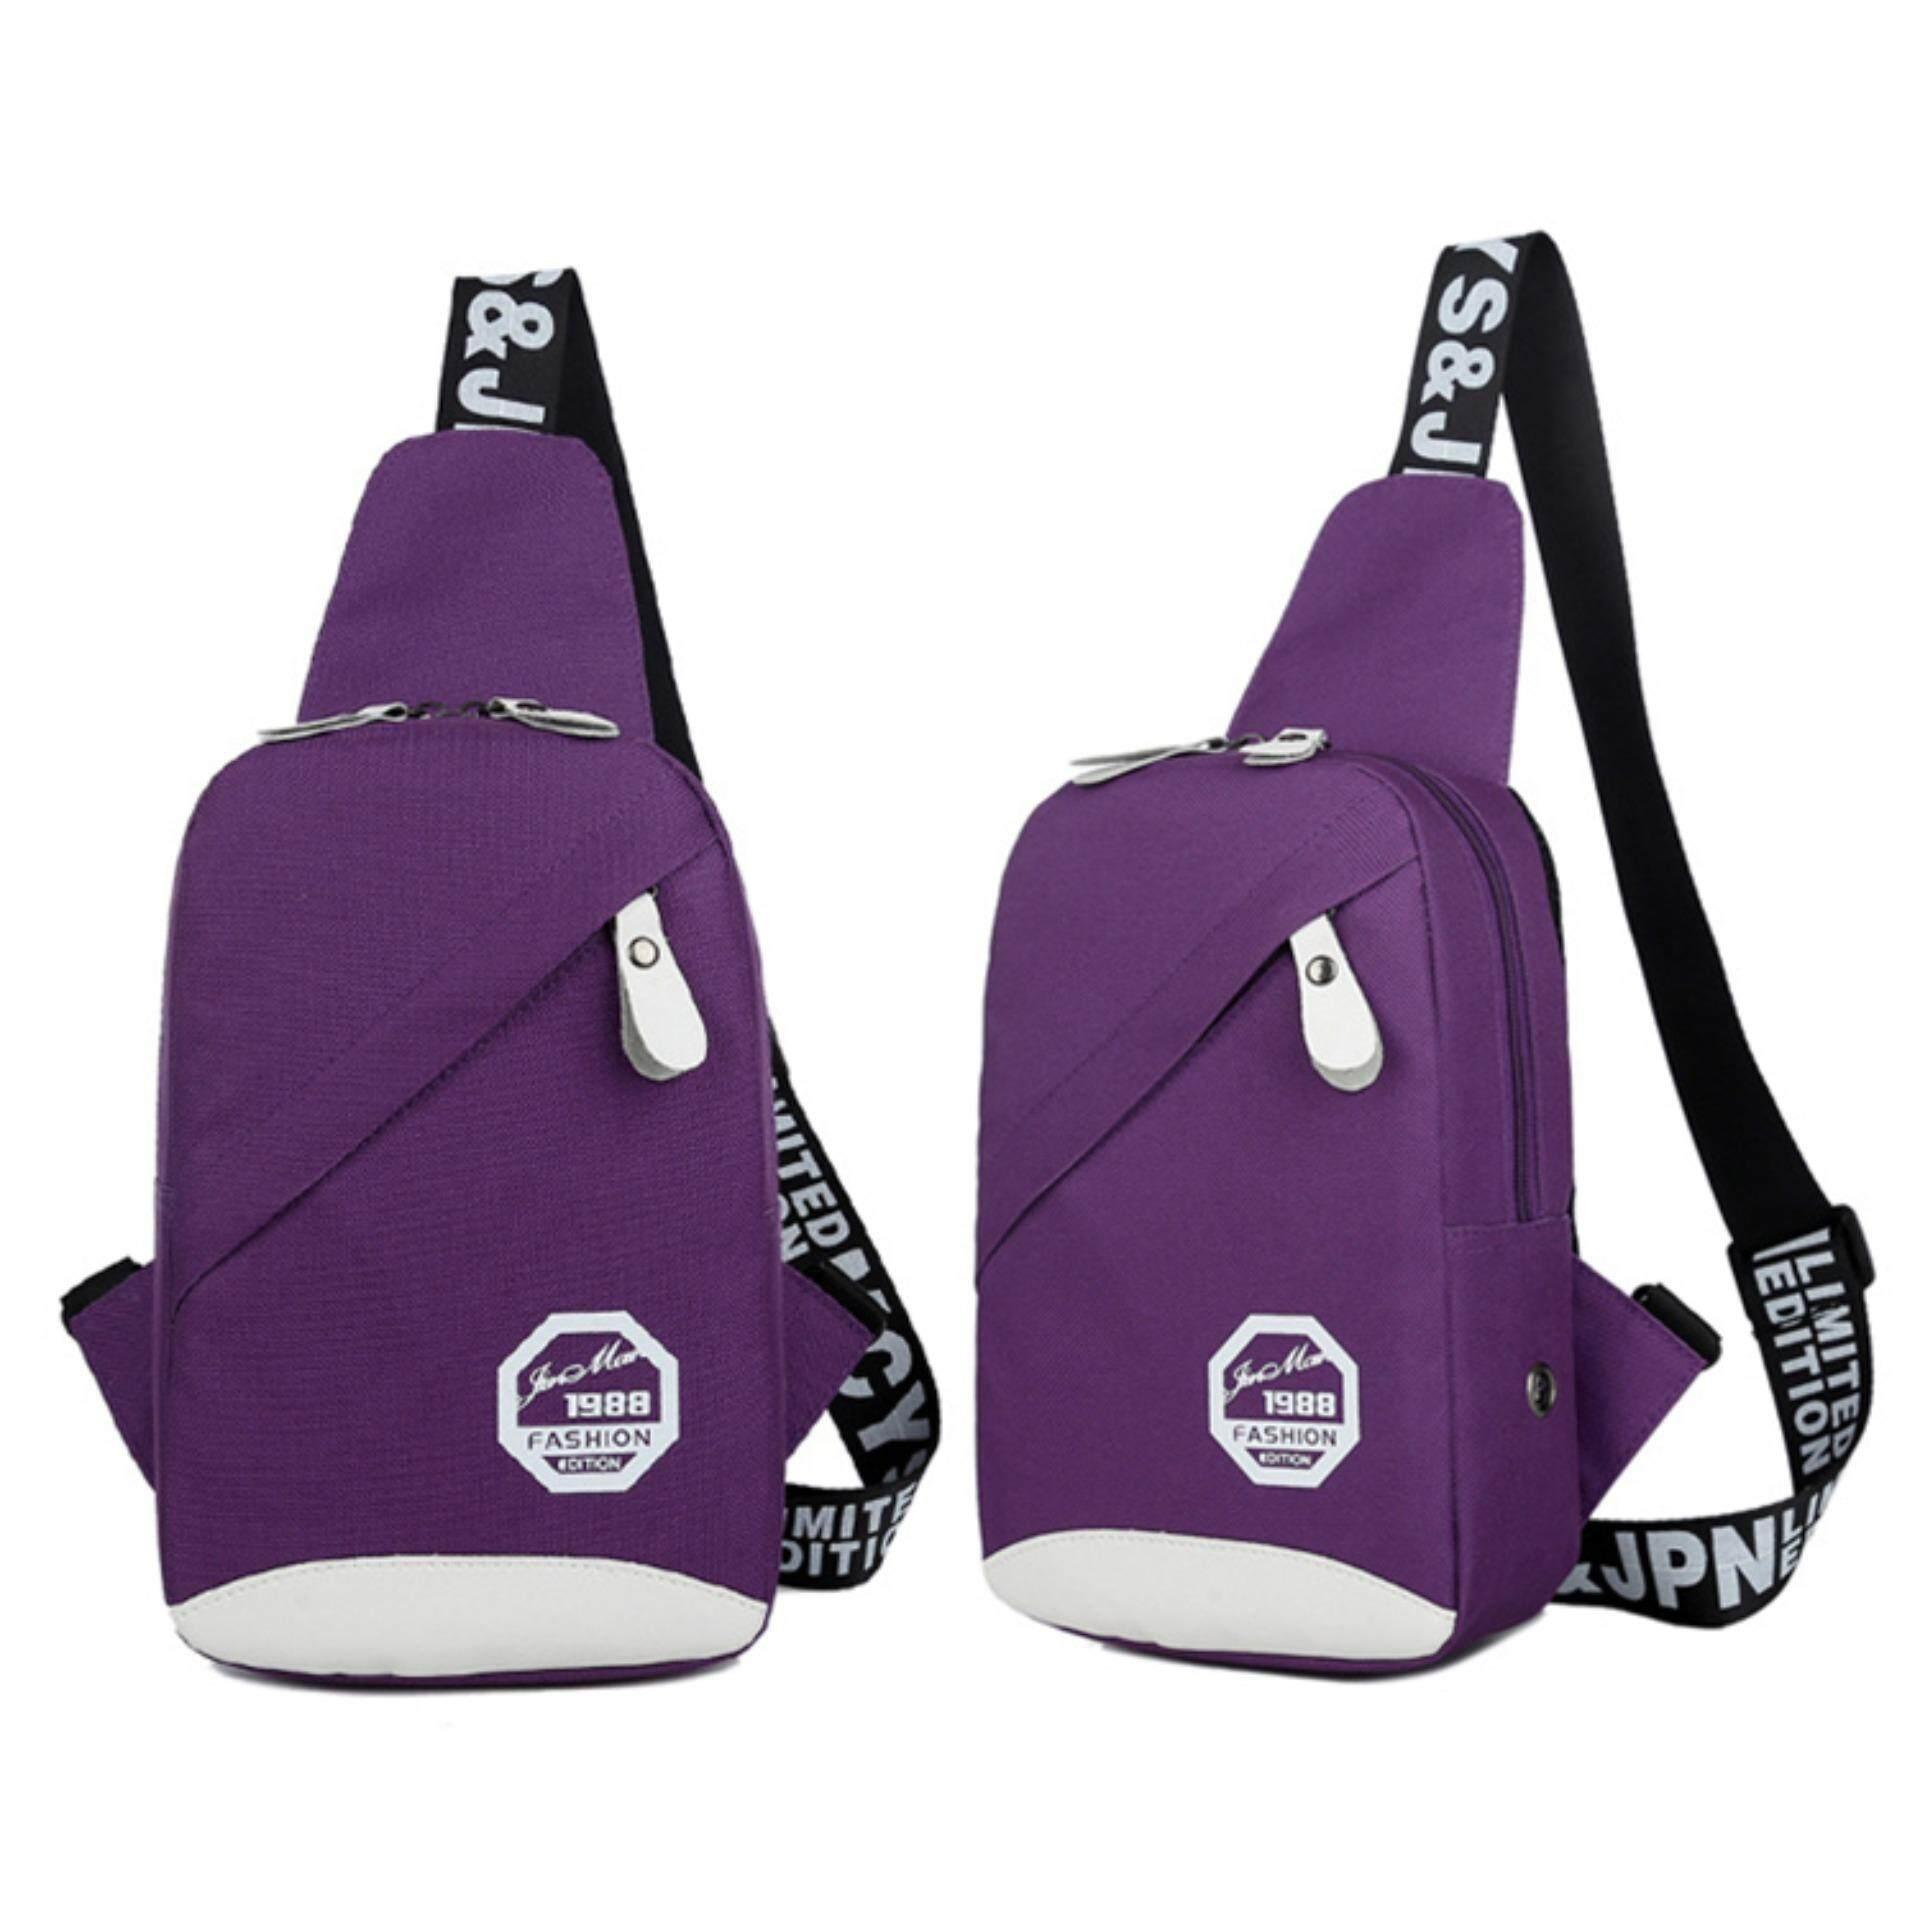 Men Bags 3 Buy At Best Price In Malaysia Lazada Adidas Adh2975 Jam Tangan Unisex Silver Warbase M37 Korean Style Fashion Canvas Crossbody Sling Bag Shoulder